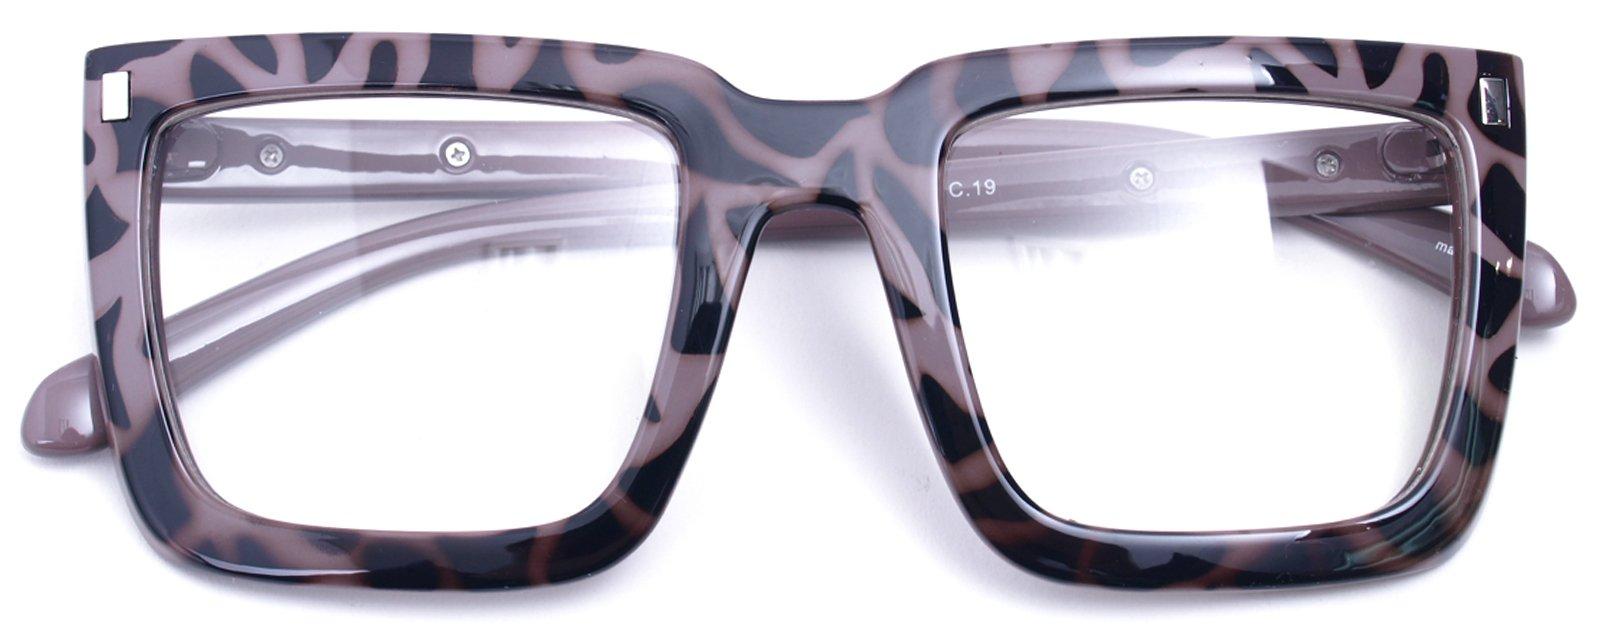 Big Square Horn Rim Eyeglasses Nerd Spectacles Clear Lens Classic Geek Glasses (TORTOISE 1830, Clear)